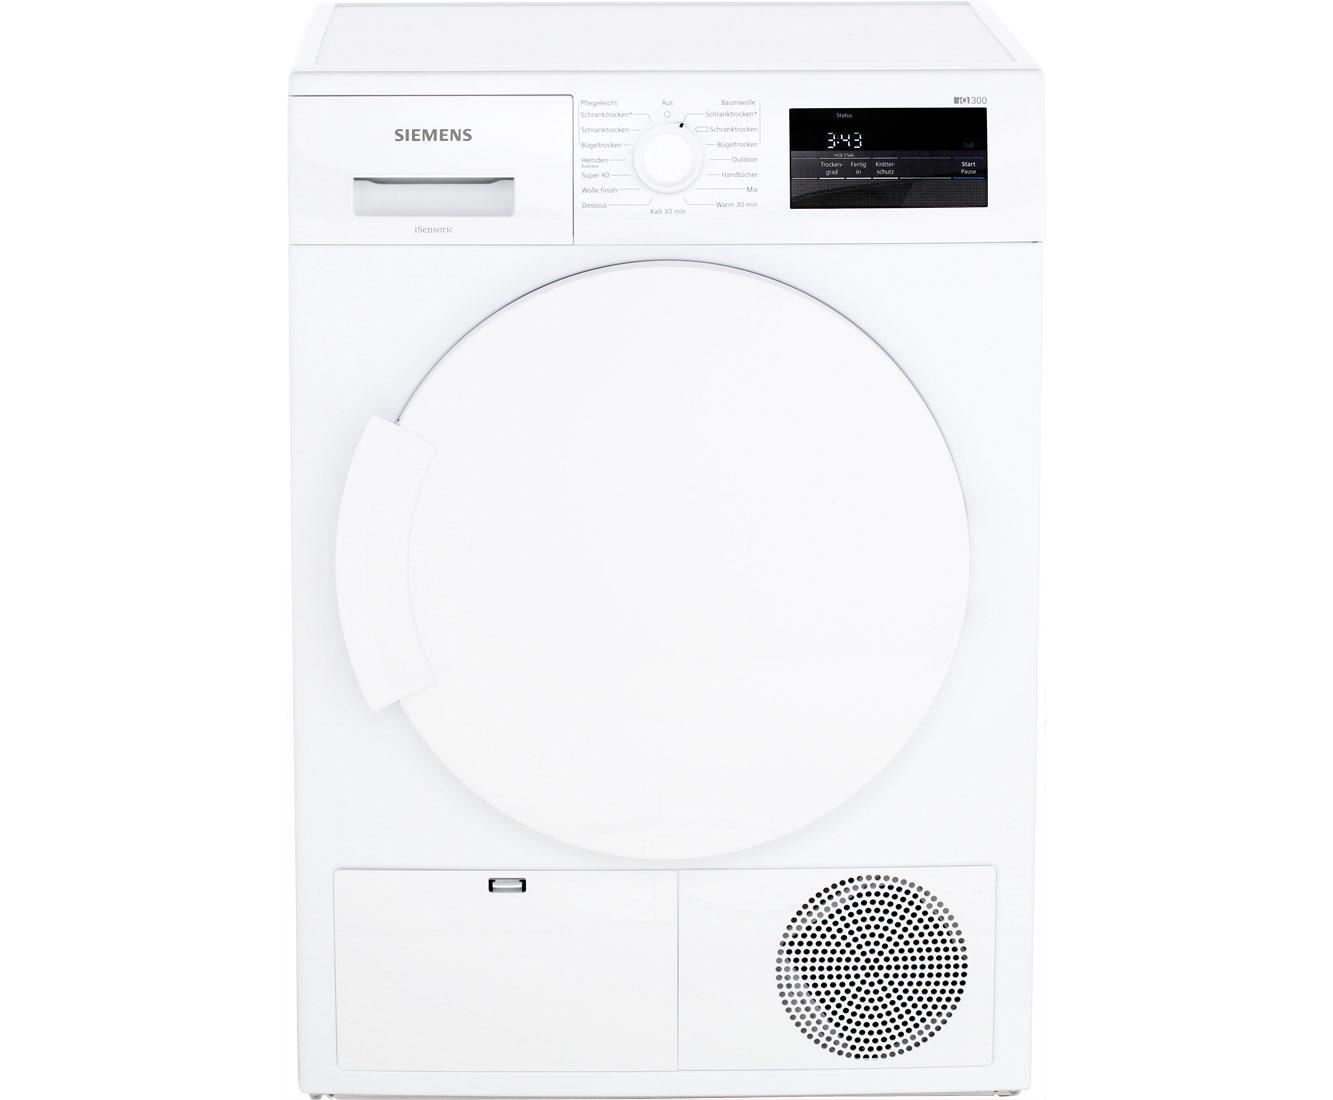 Siemens IQ300 WT43H000 Wärmepumpentrockner   7 Kg, Weiß, A+